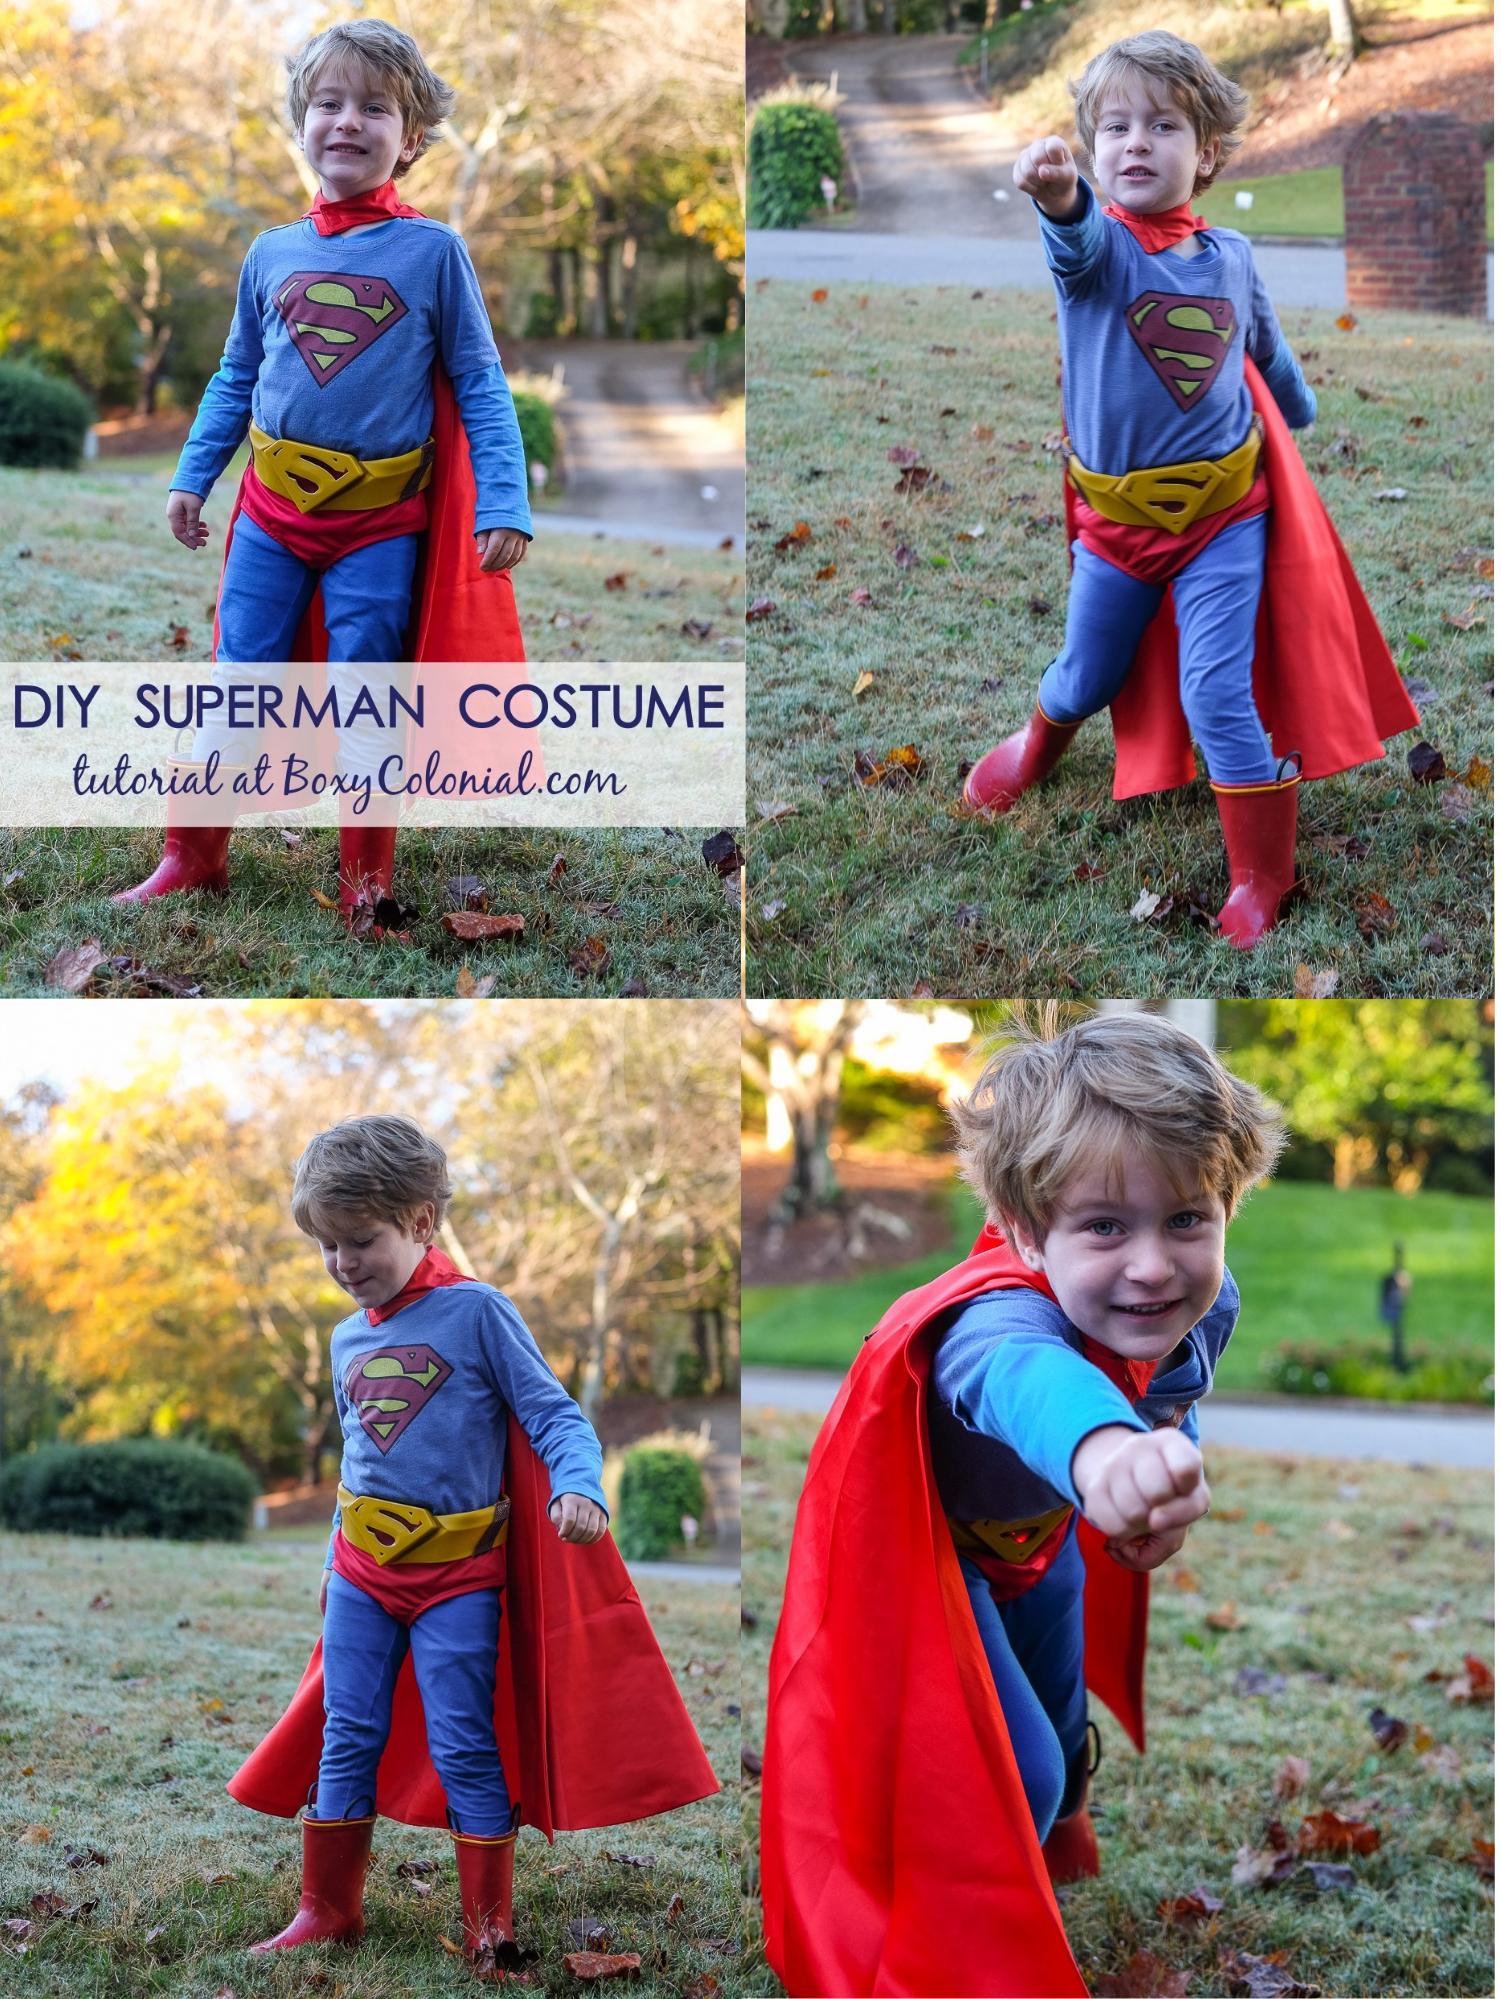 made up superhero costume ideas